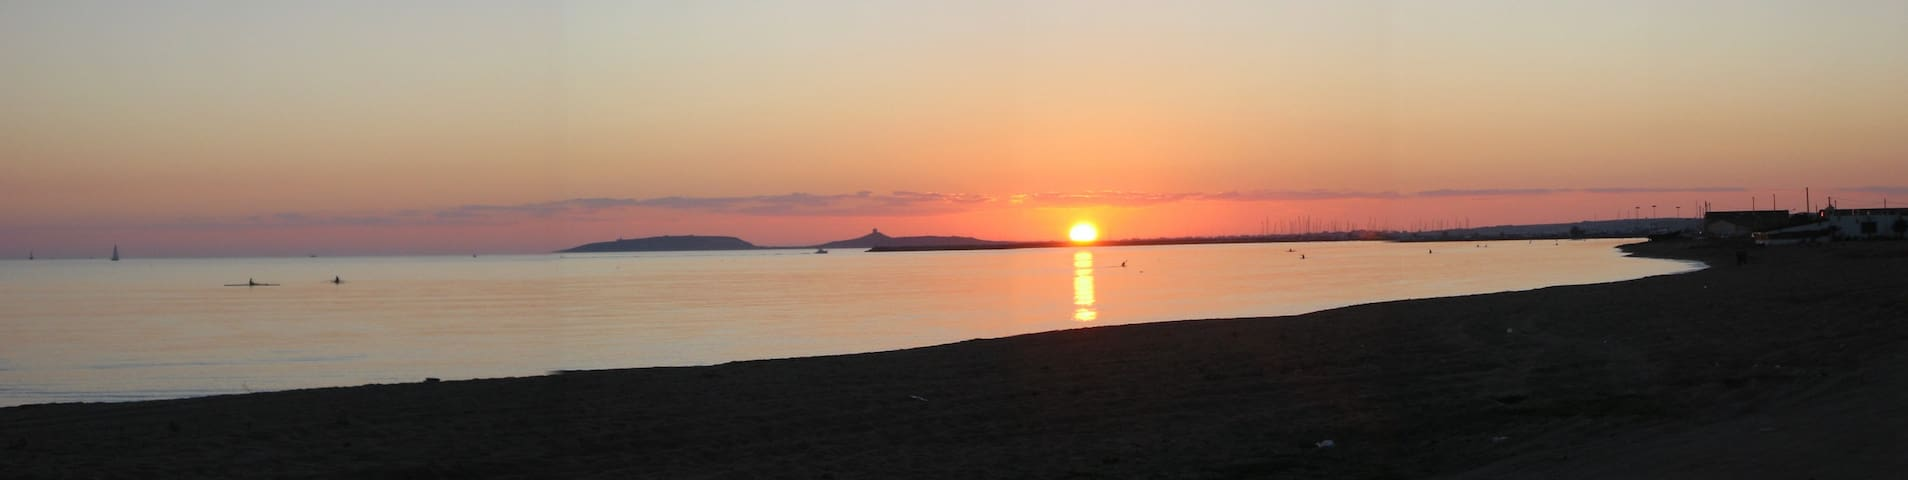 Sardegna, Torregrande lungomare - Torre Grande - Casa